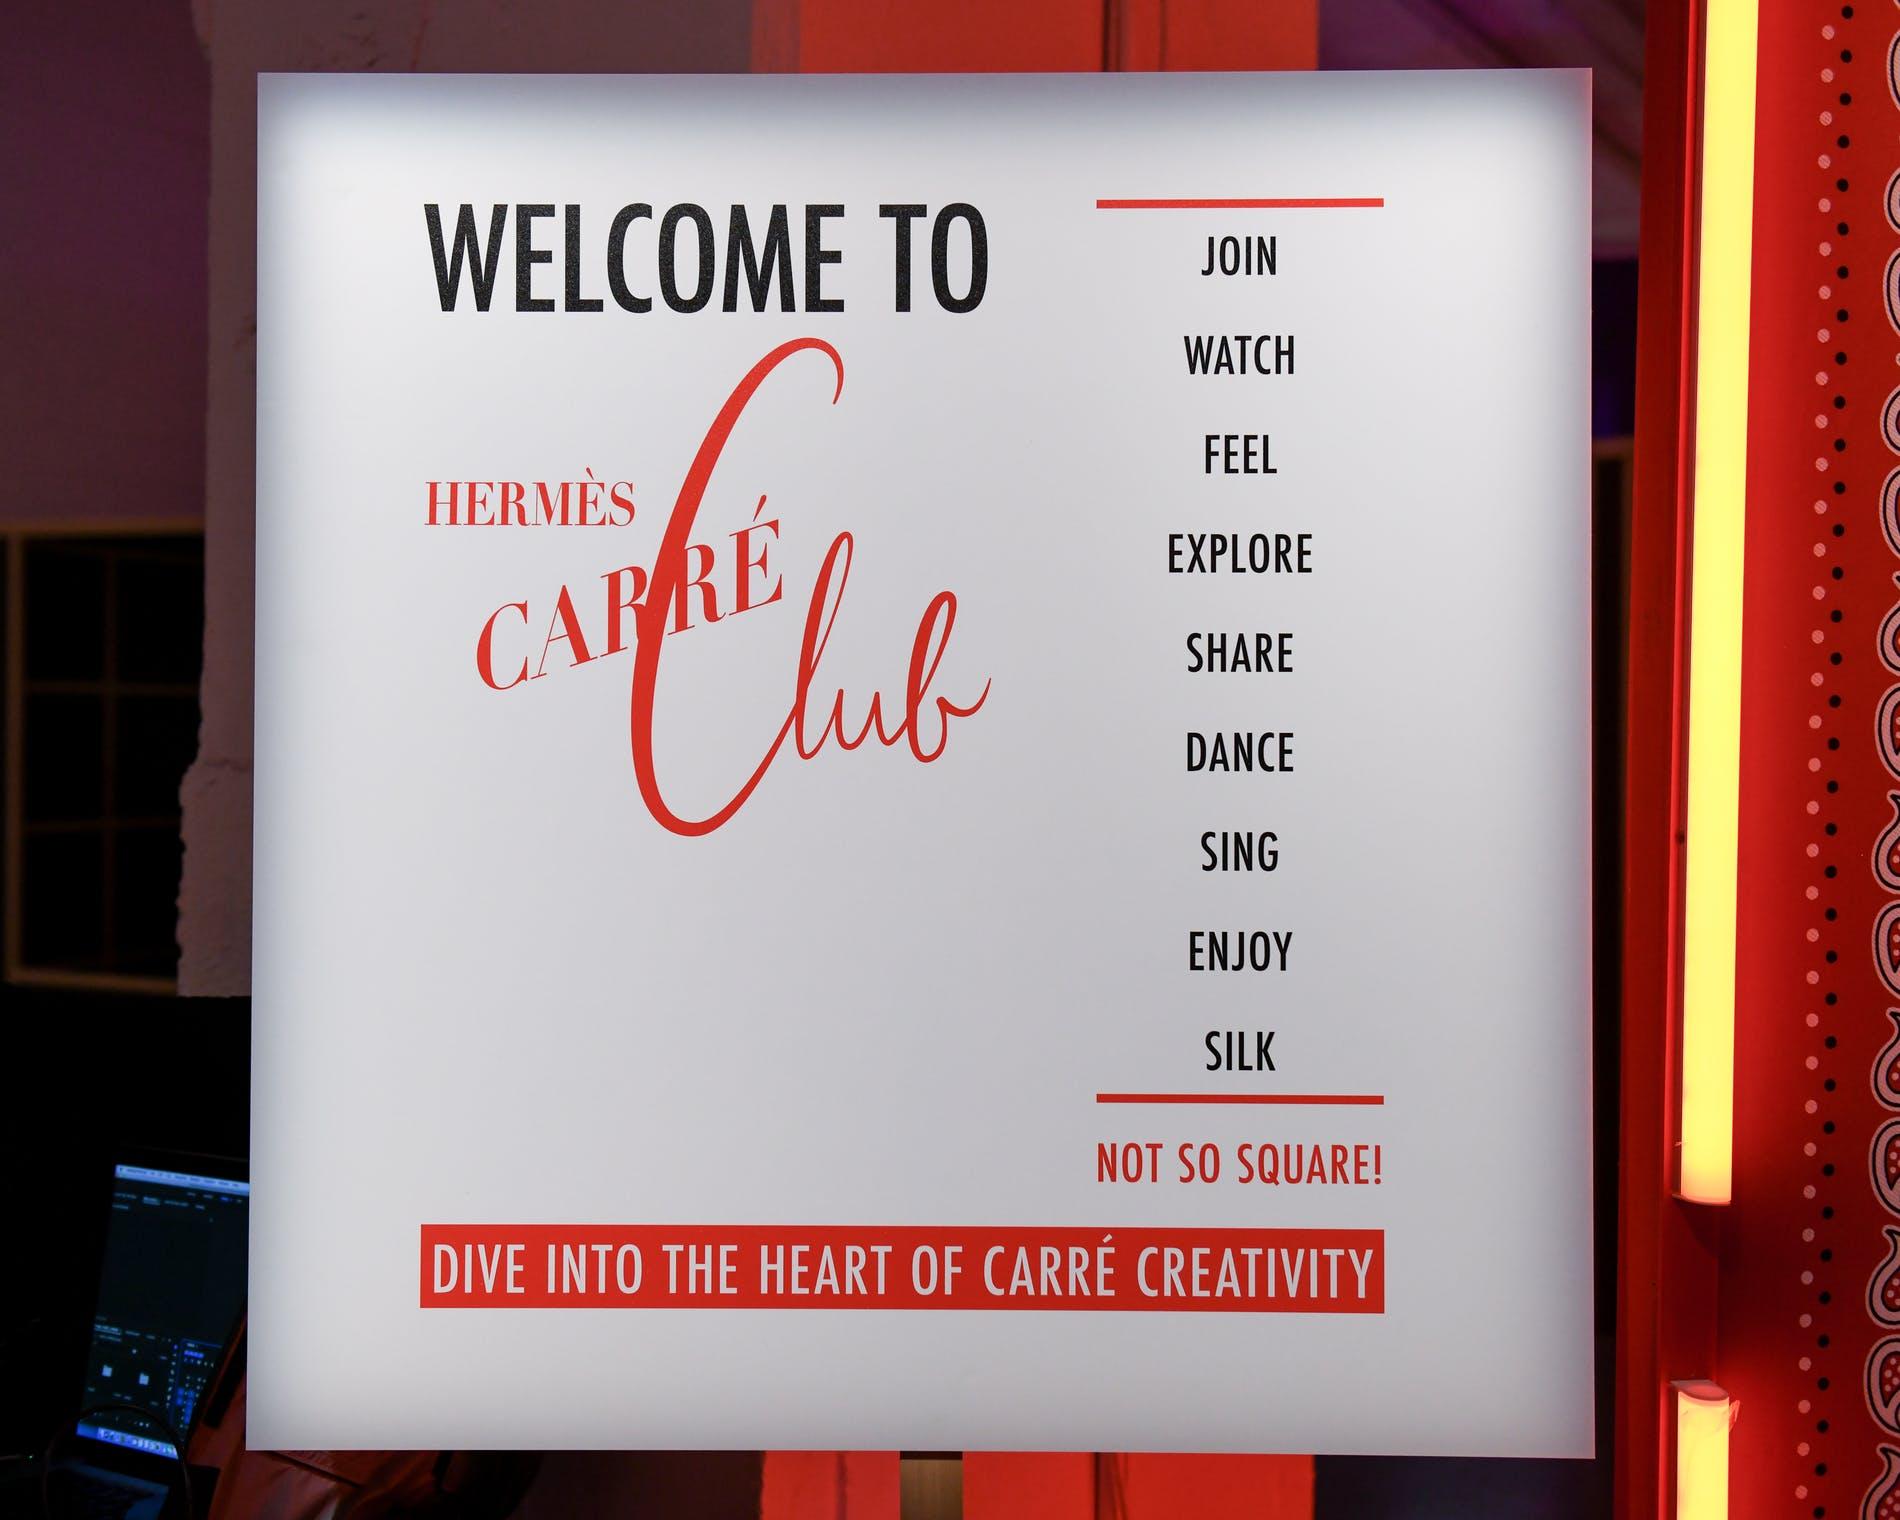 1538709334503448-Herme-s-Carre-Club-2-